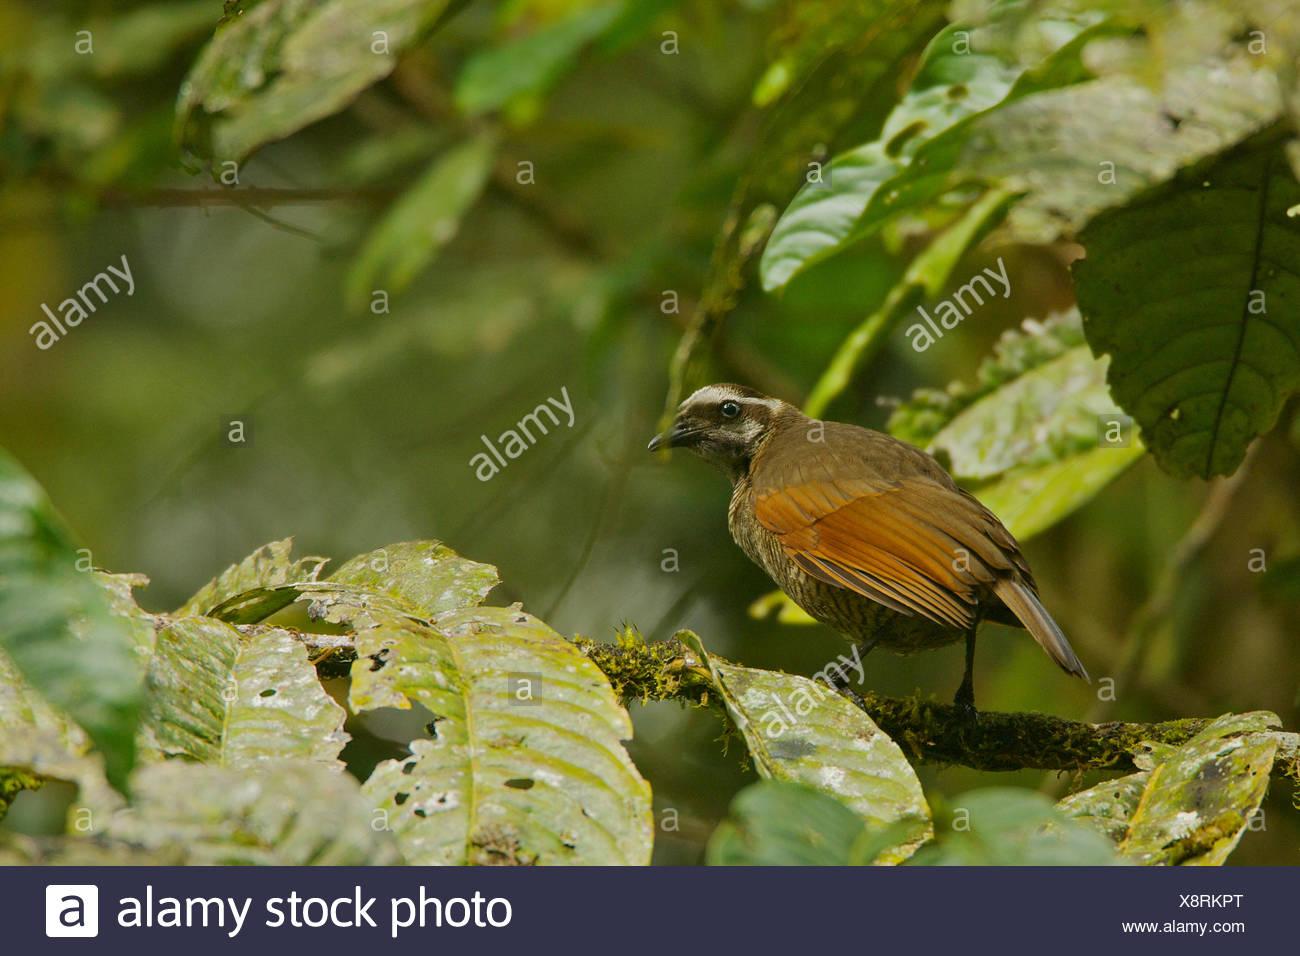 A female bronze parotia bird of paradise in the Foja Mountains. - Stock Image